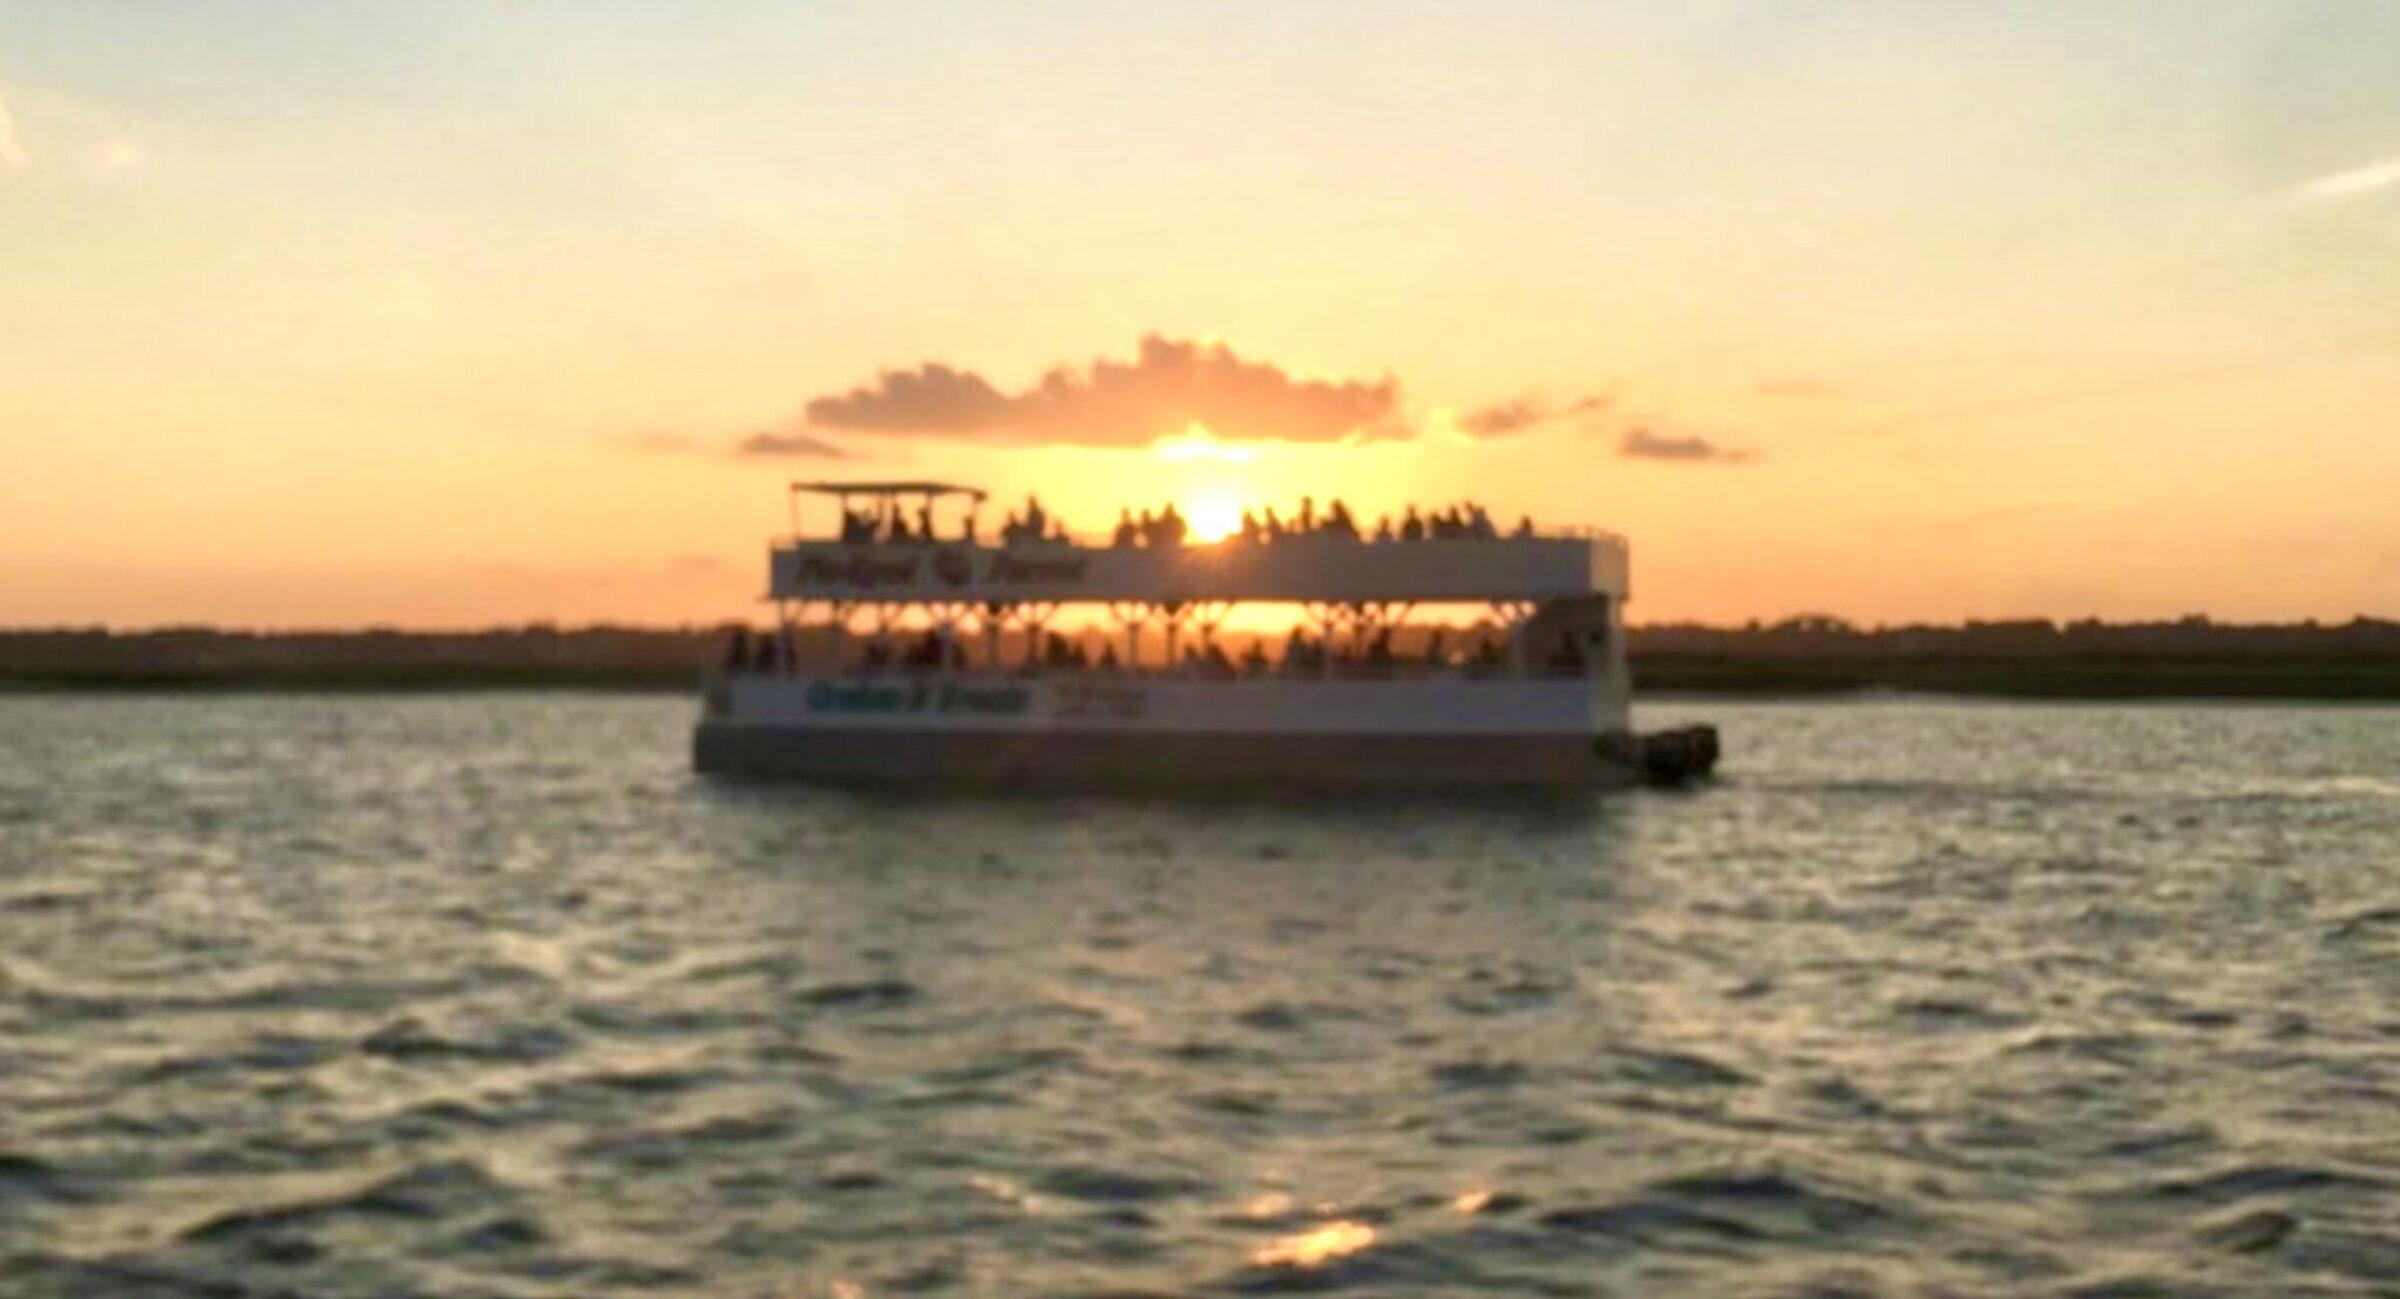 Murrells Inlet Happy Hour Cruise | Myrtle Beach Sunset Booze Cruise